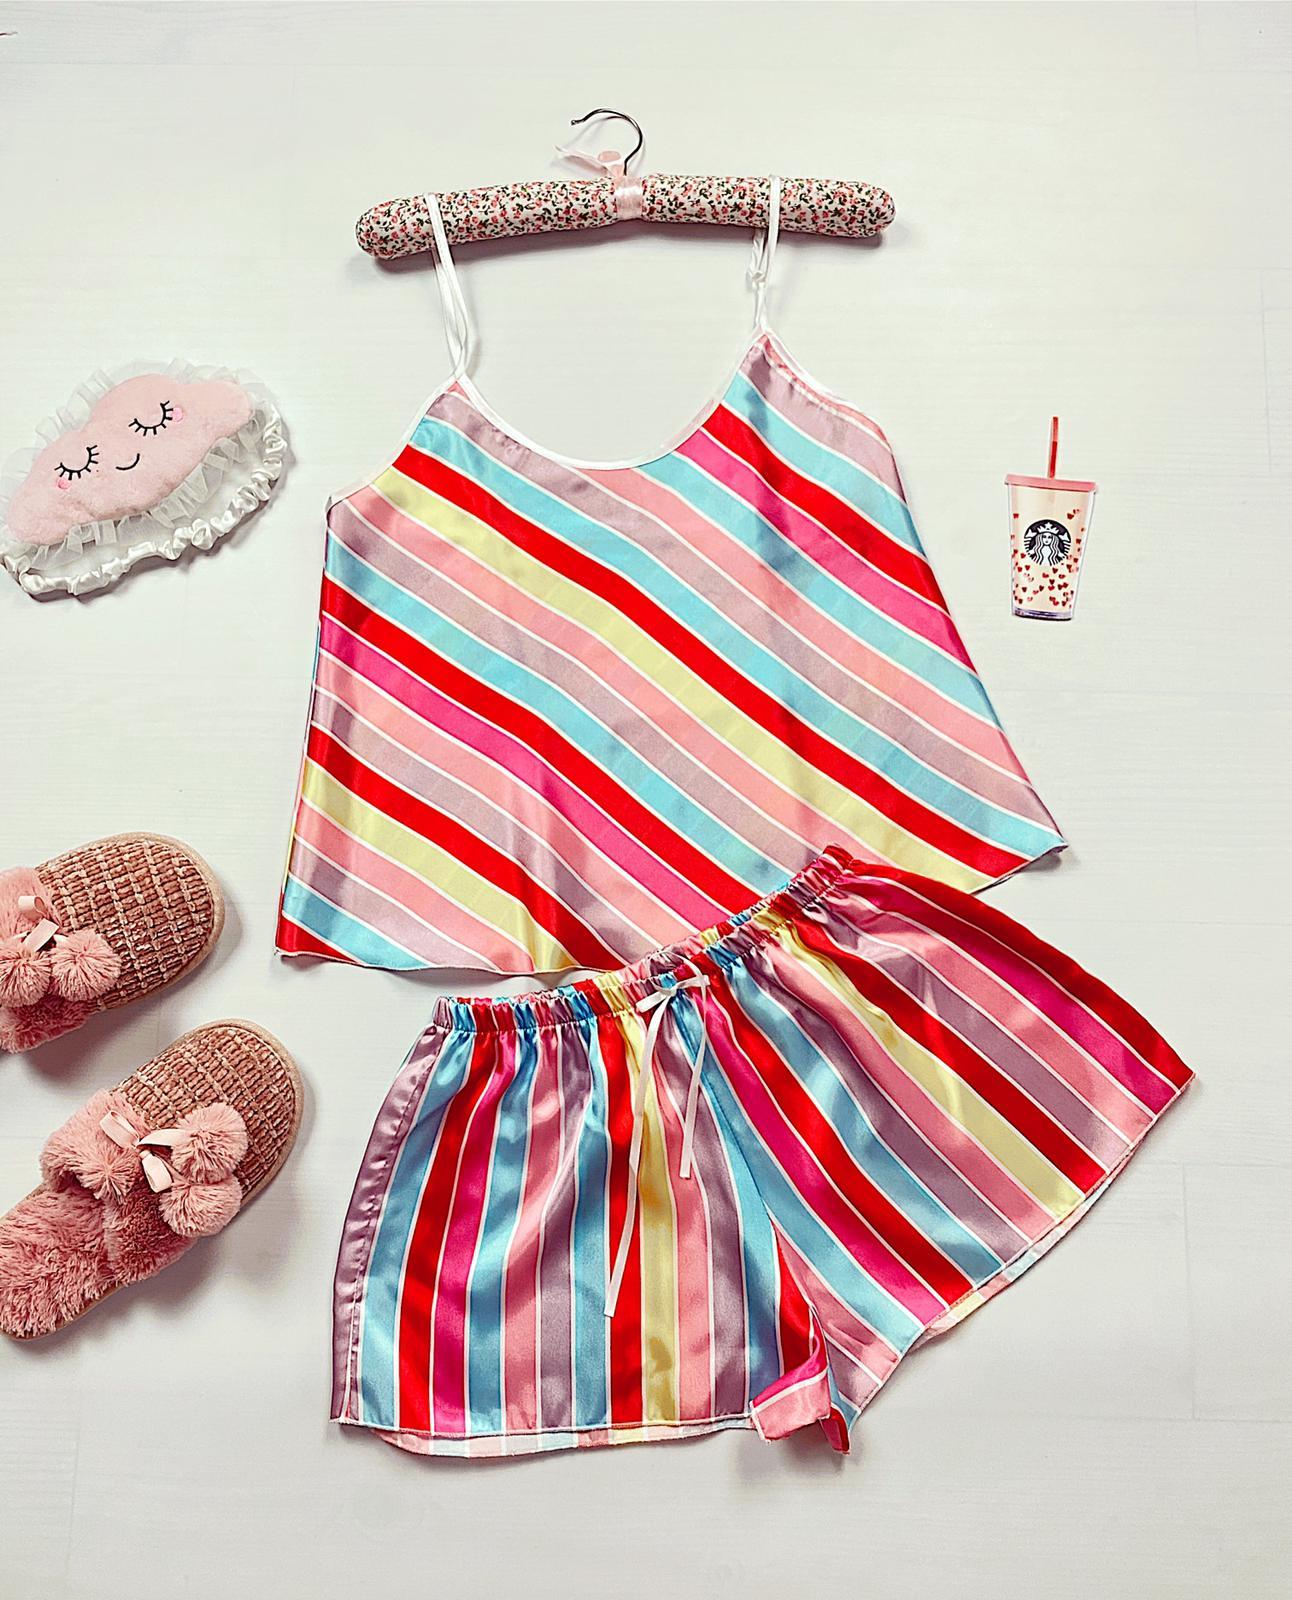 Compleu pijama scurt colorat din satin cu imprimeu dungi